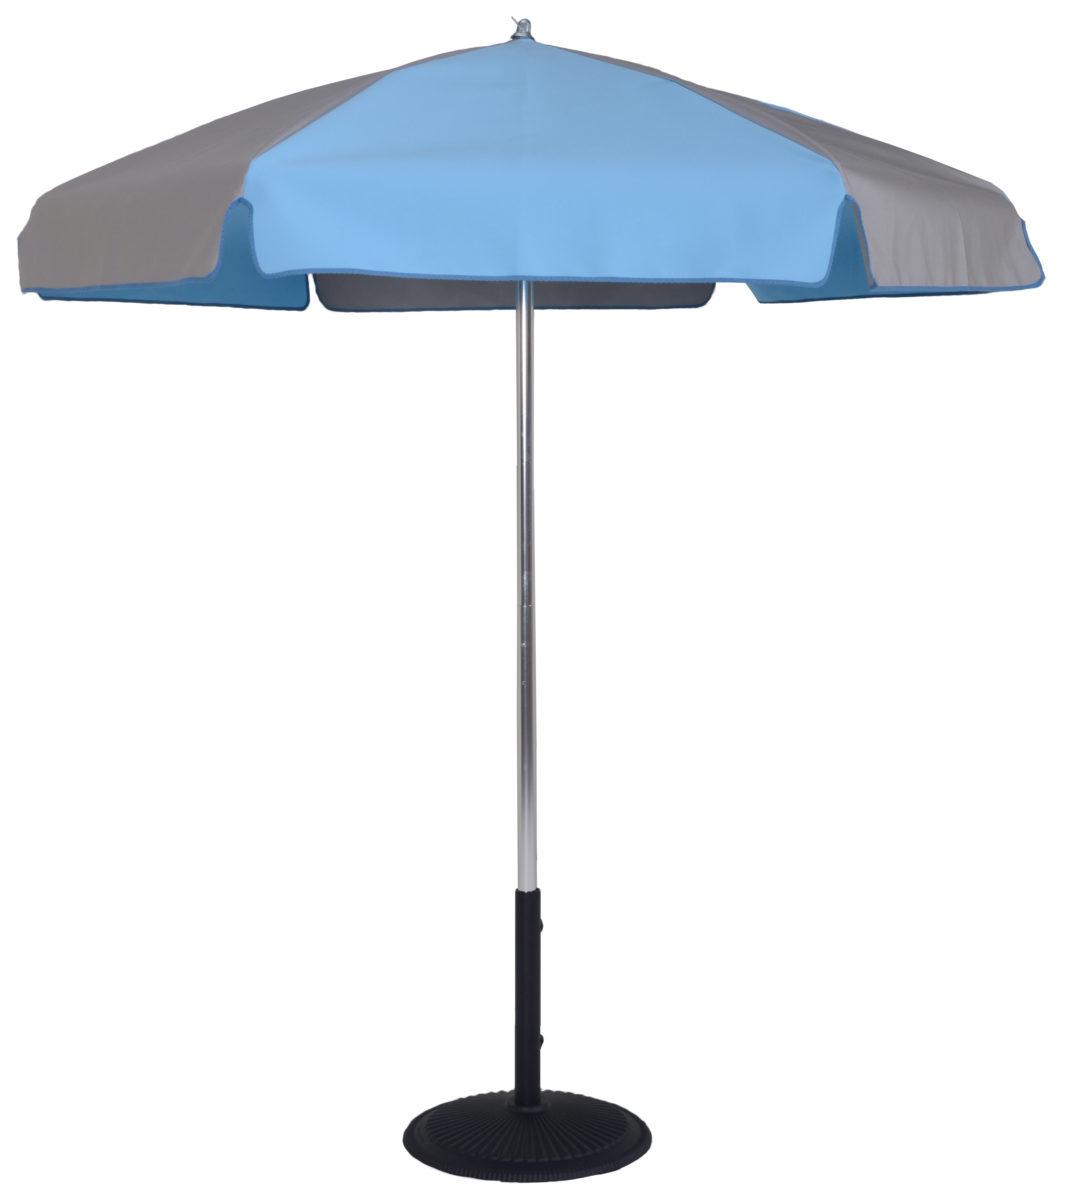 6 5 Ft Aluminum Pop Up Steel Rib Push On Tilt Umbrella Flat Bottom